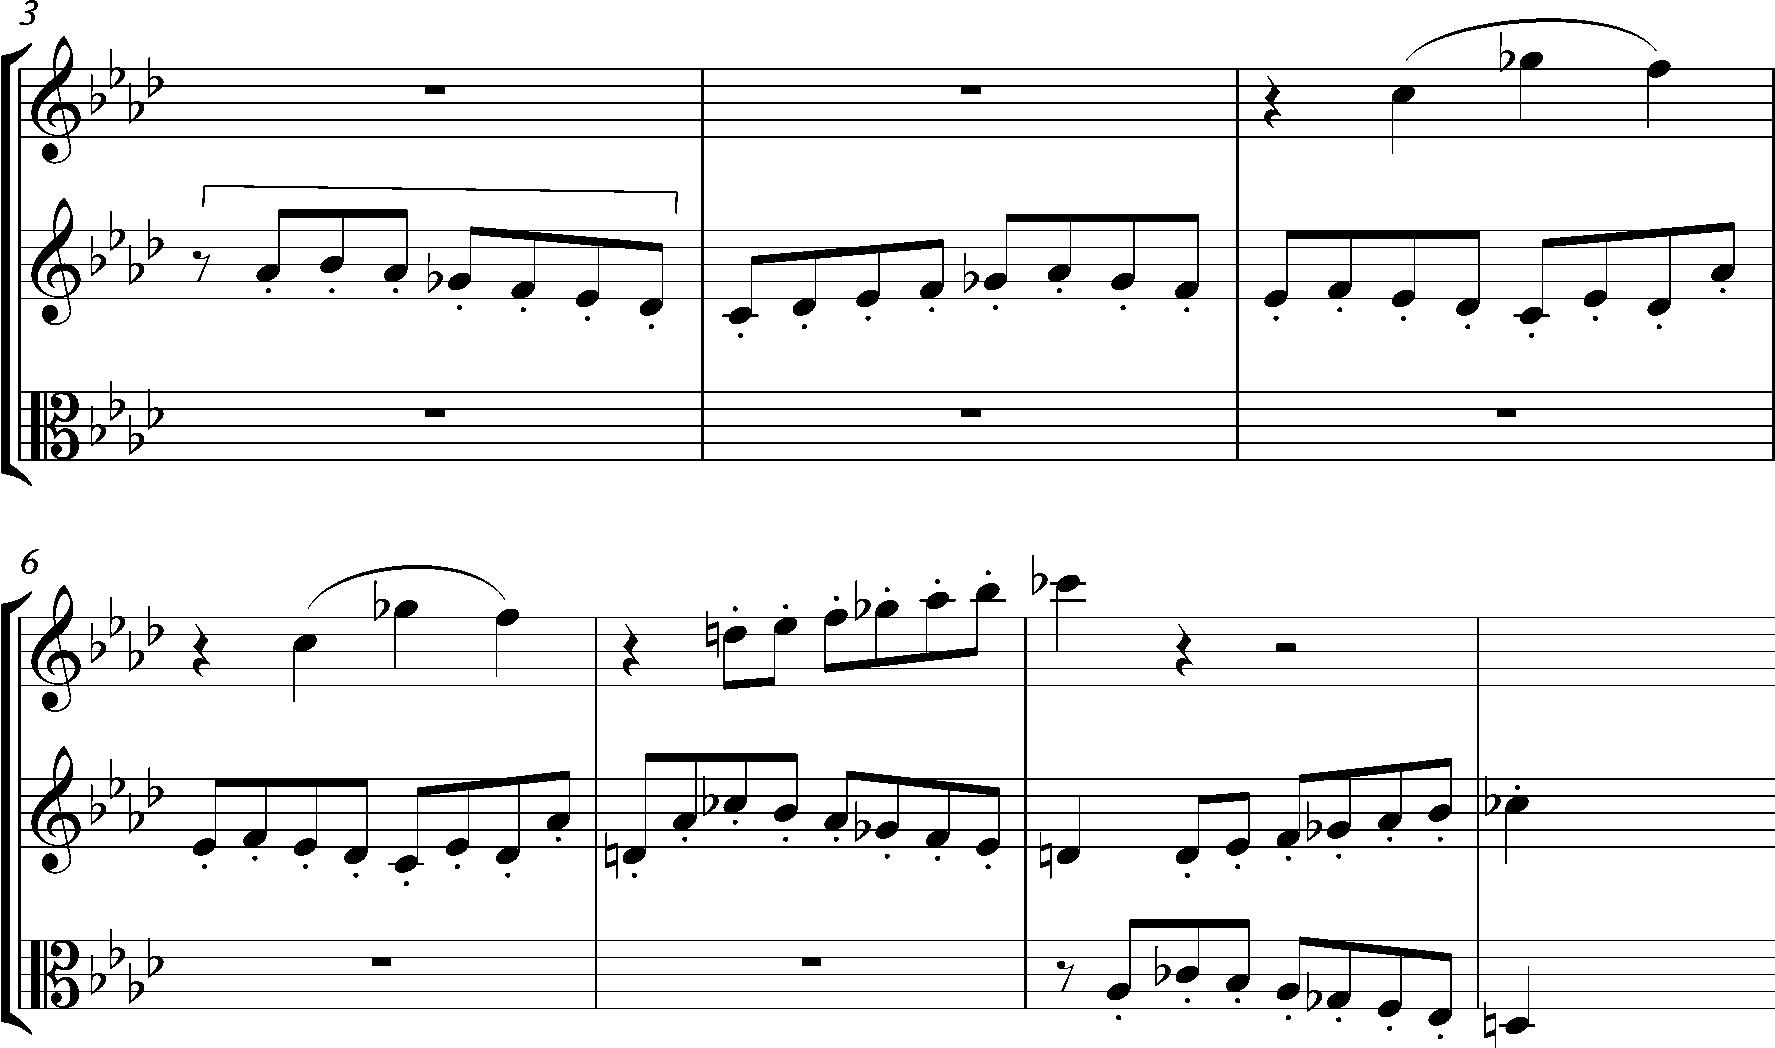 Augmentation music wikipedia beethoven symphony no 6 fourth movement bars 3 8 buycottarizona